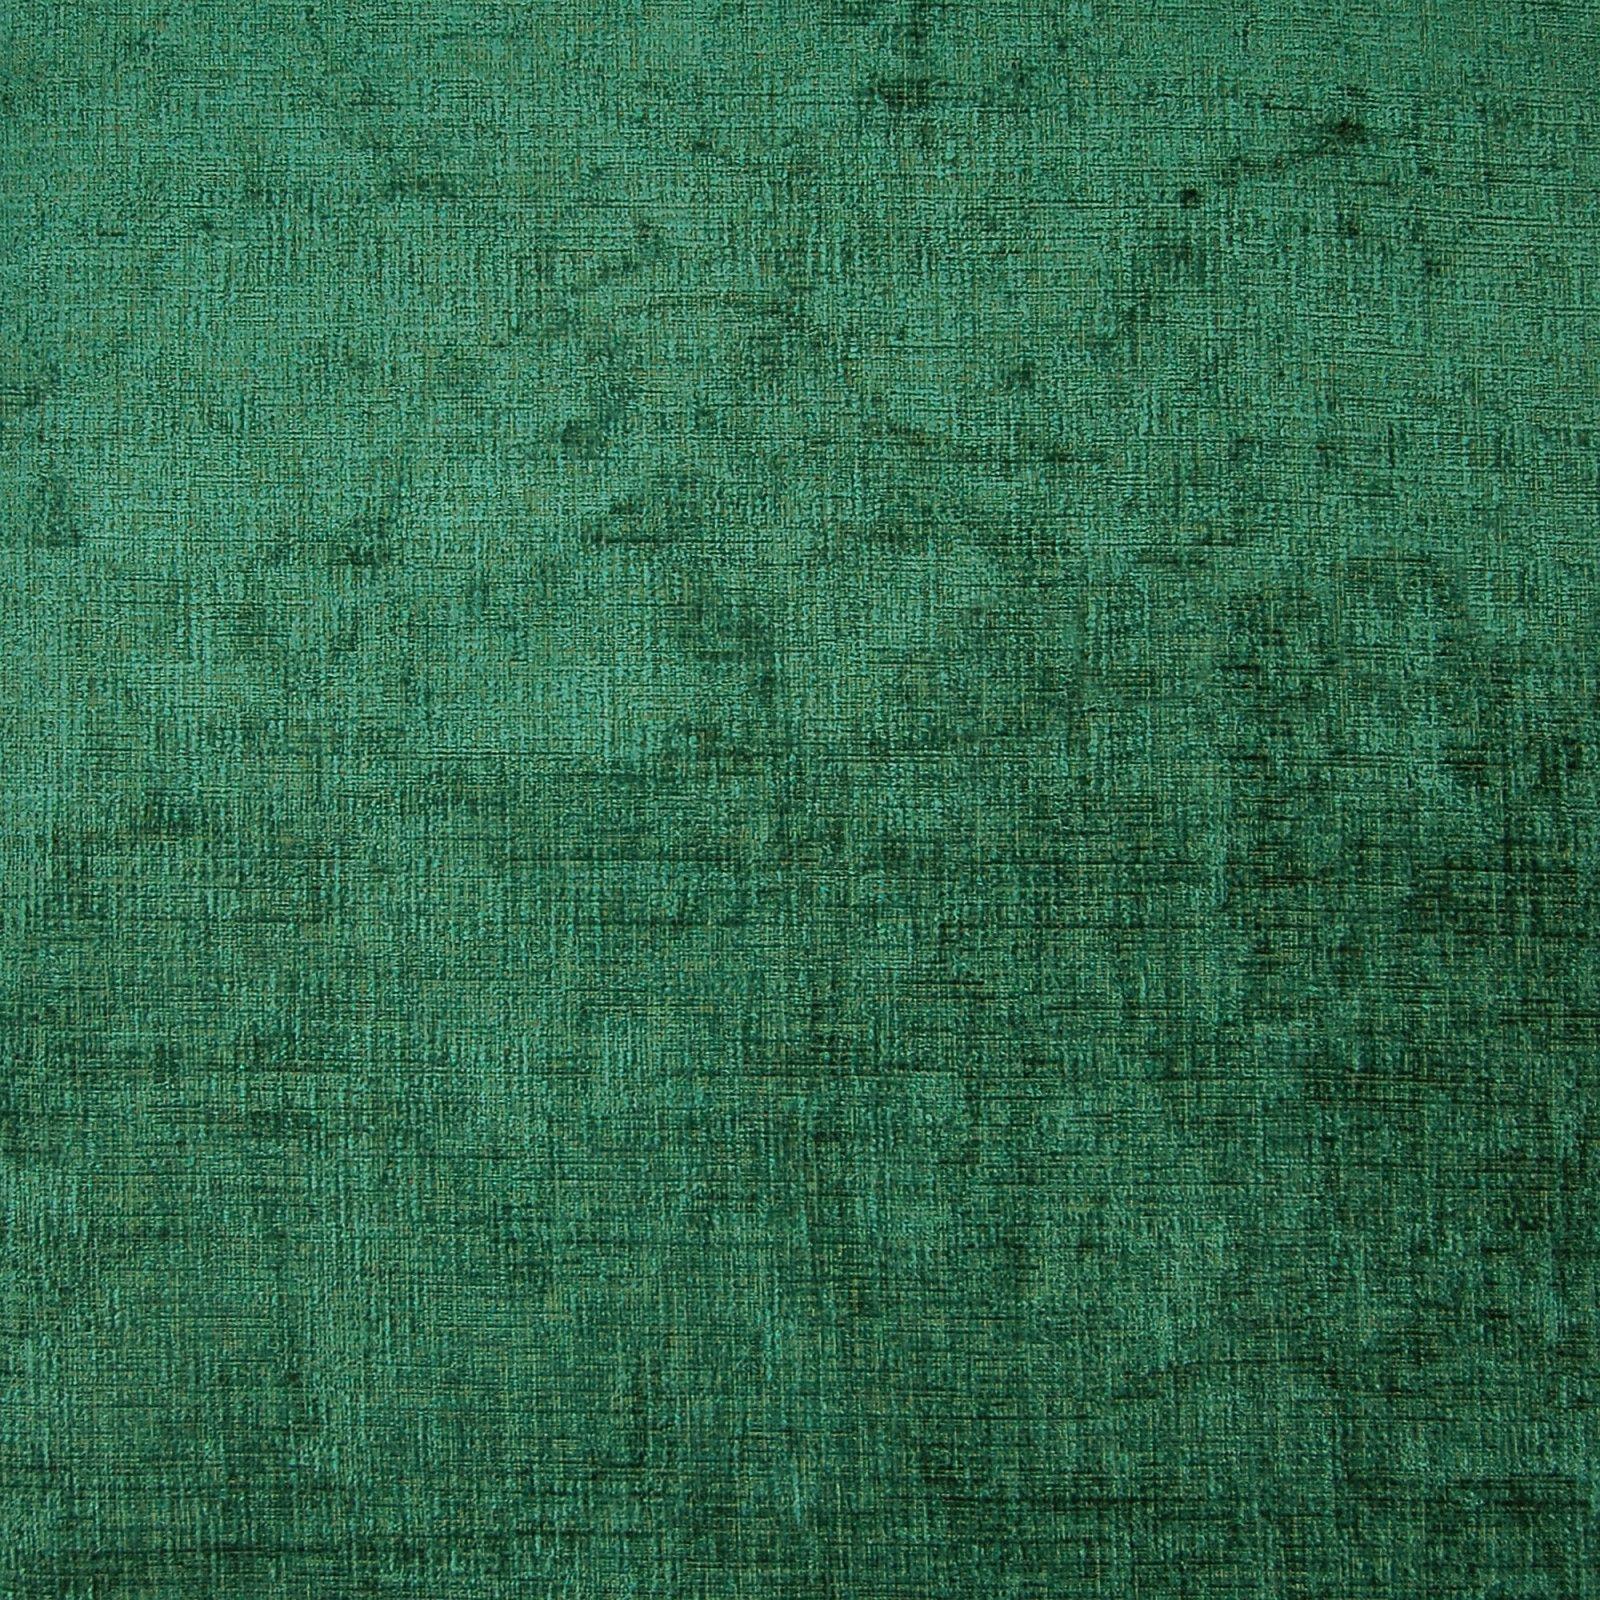 Pea Green Solid Velvet Upholstery Fabric In 2019